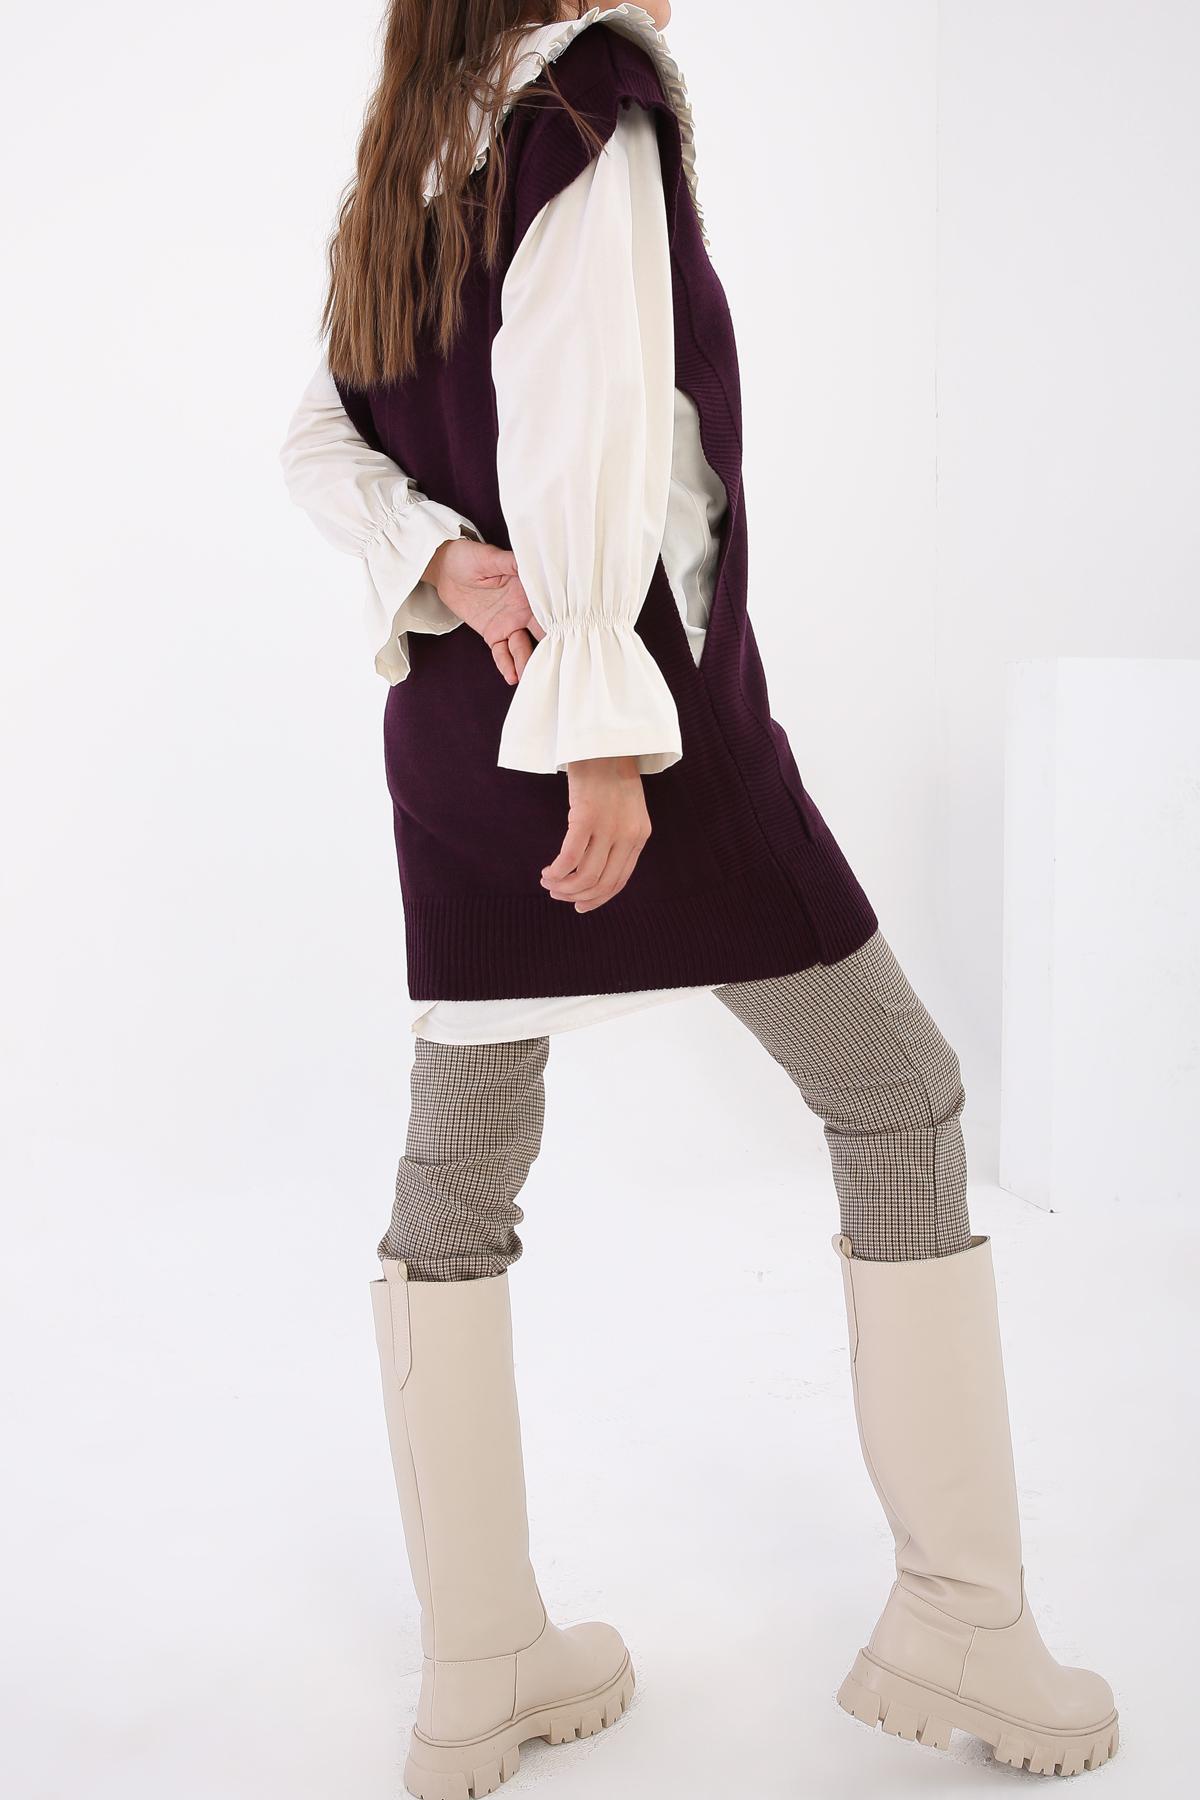 V Neck Comfy Knitwear Sweater